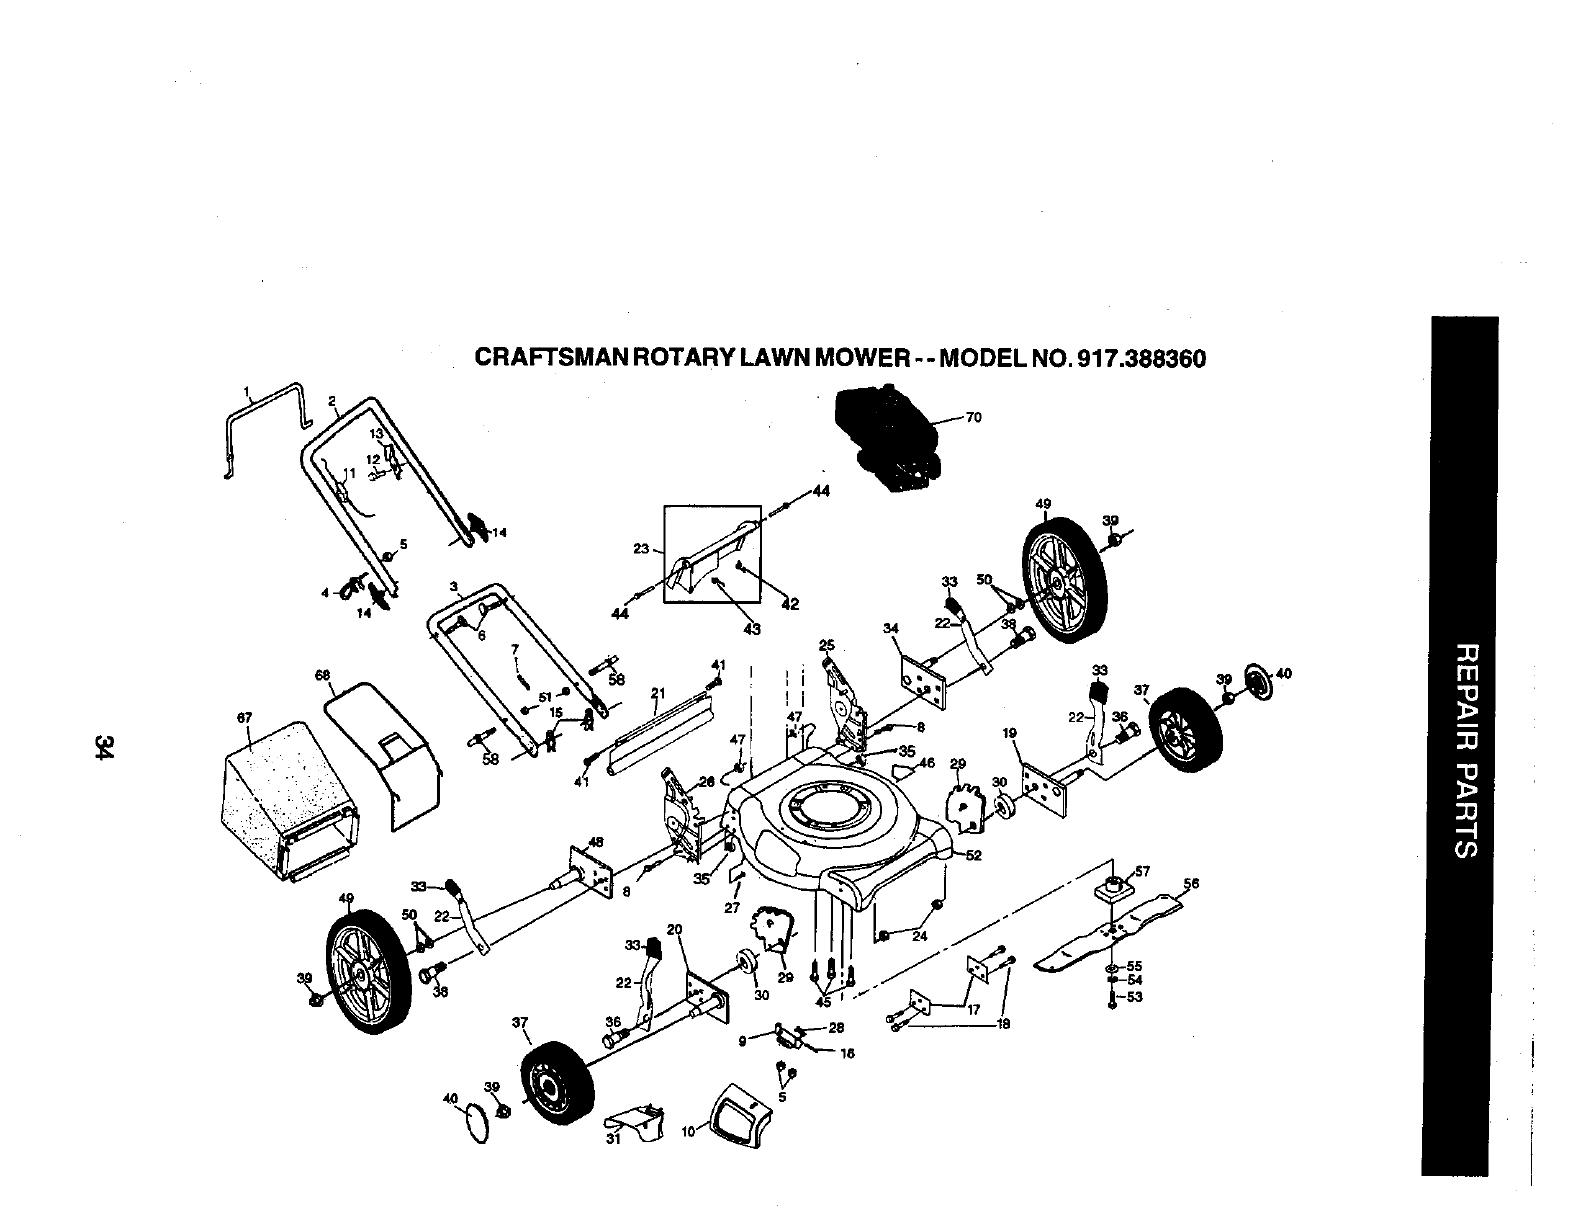 Craftsman 917388360 User Manual 6.25HP 21 ROTARY LAWN